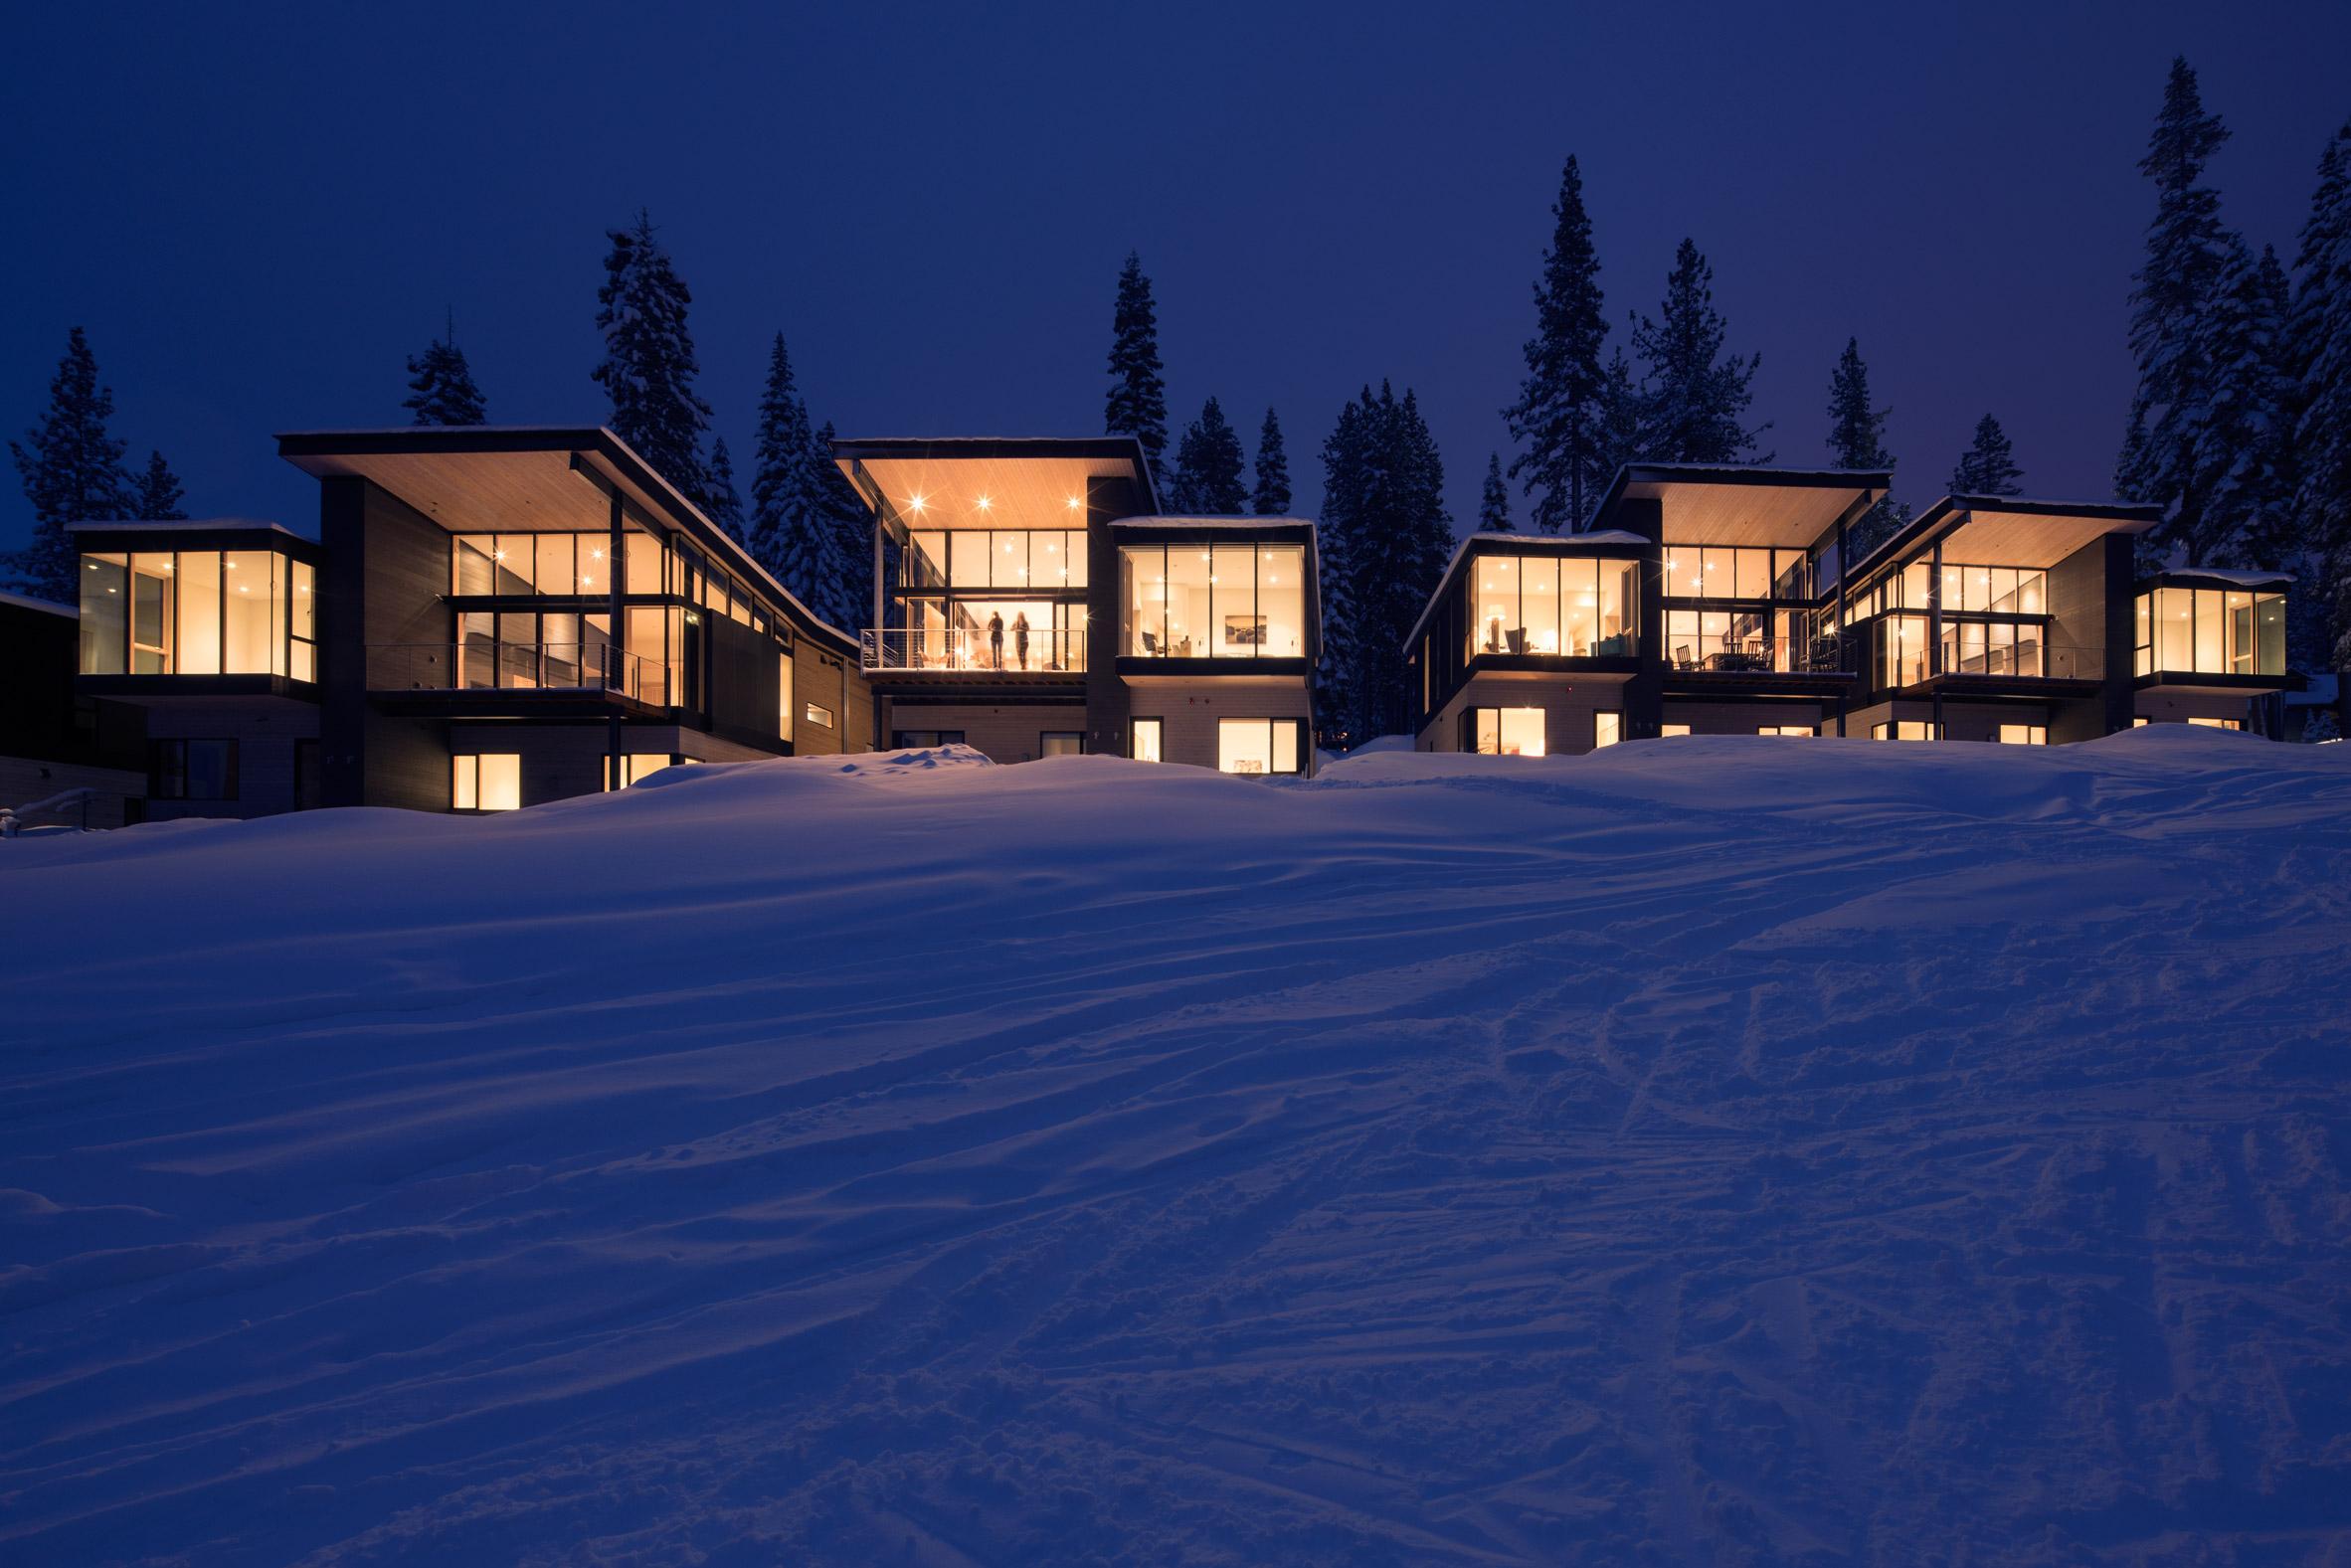 Northstar's Stellar Residences & Townhomes by Bohlin Cywinski Jackson